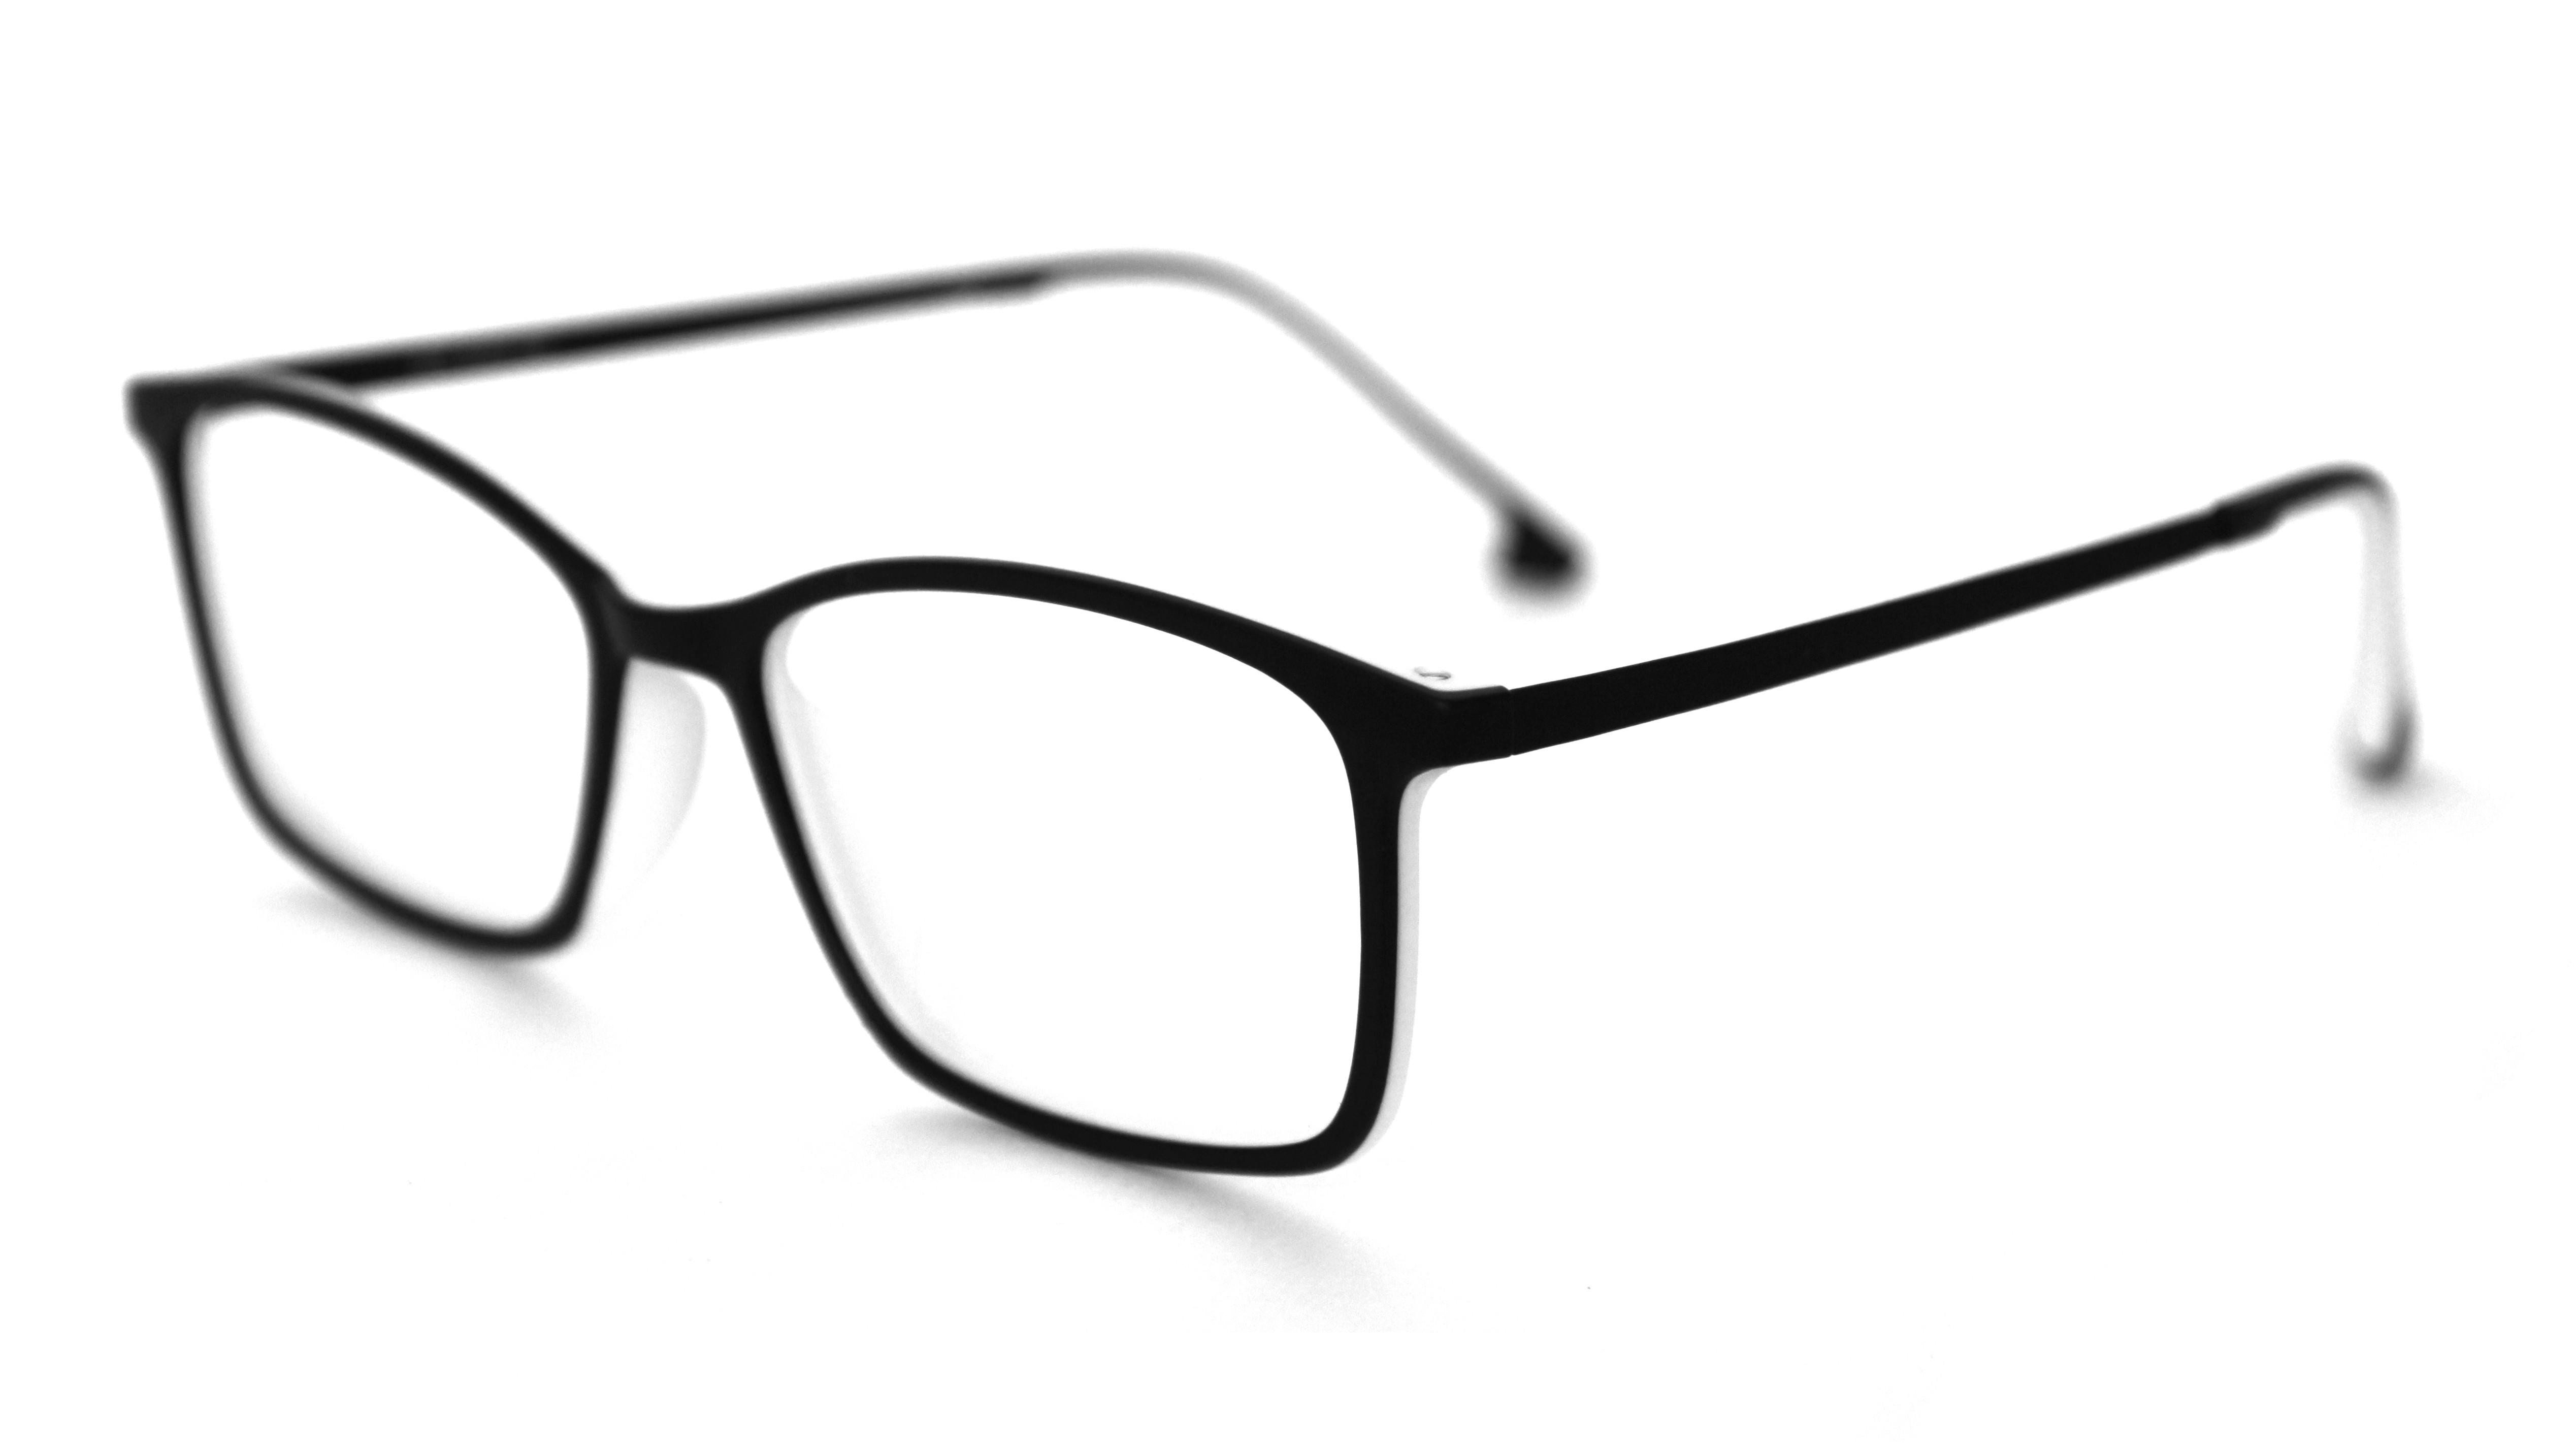 Куплю glasses в одинцово кронштейн телефона iphone (айфон) для бпла spark